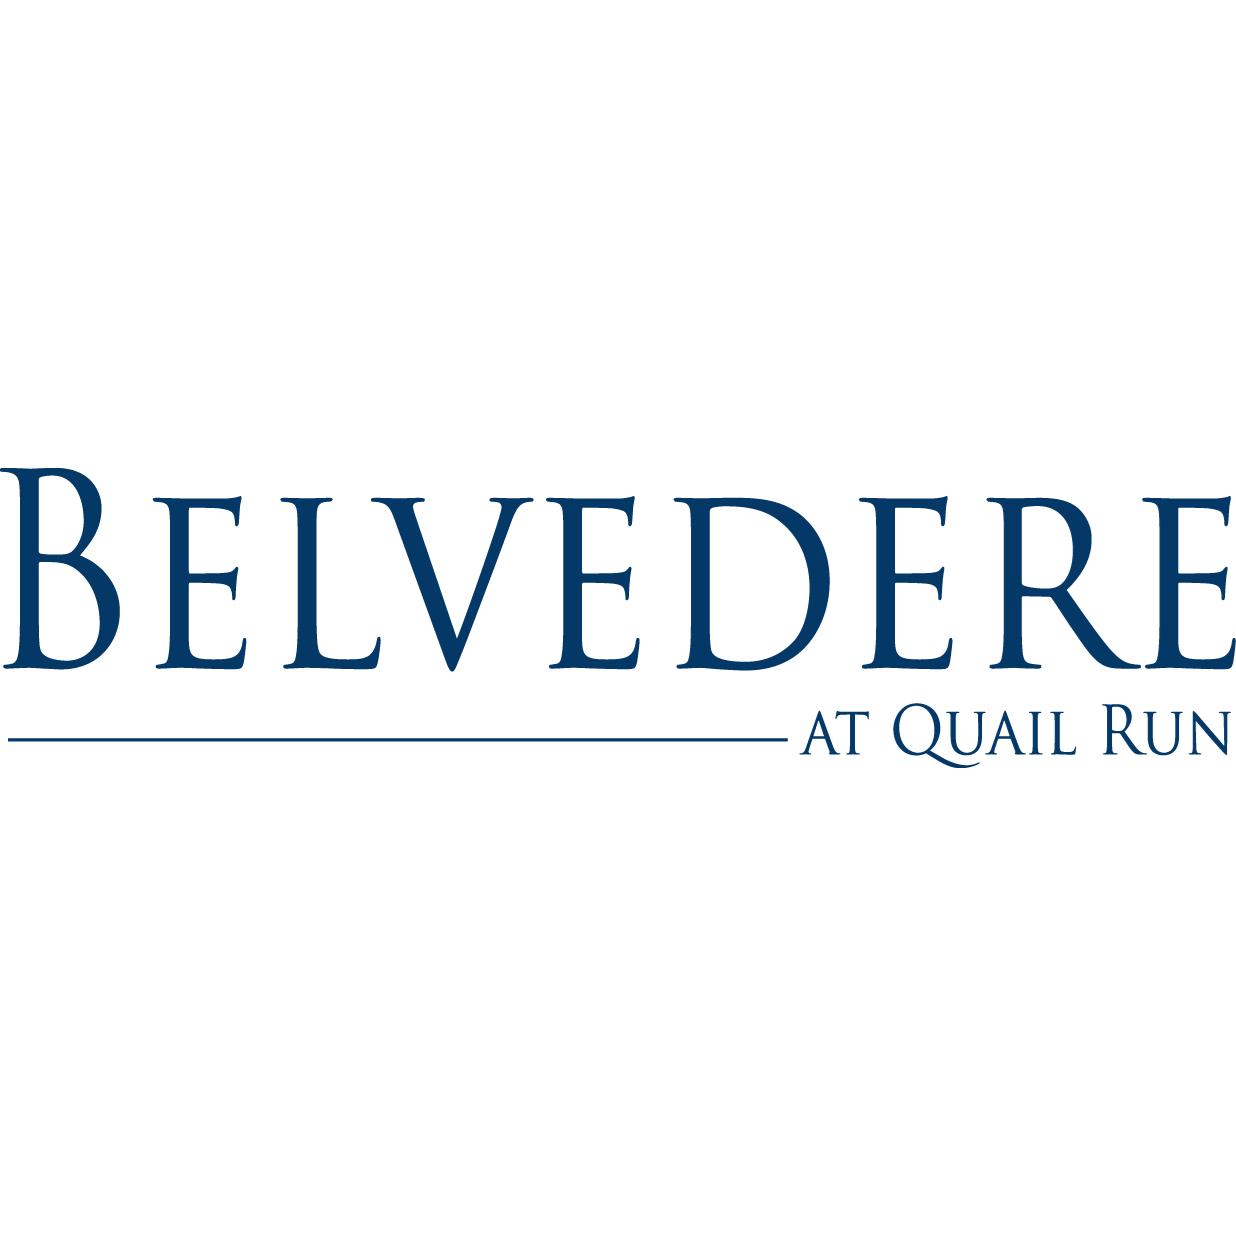 Belvedere at Quail Run